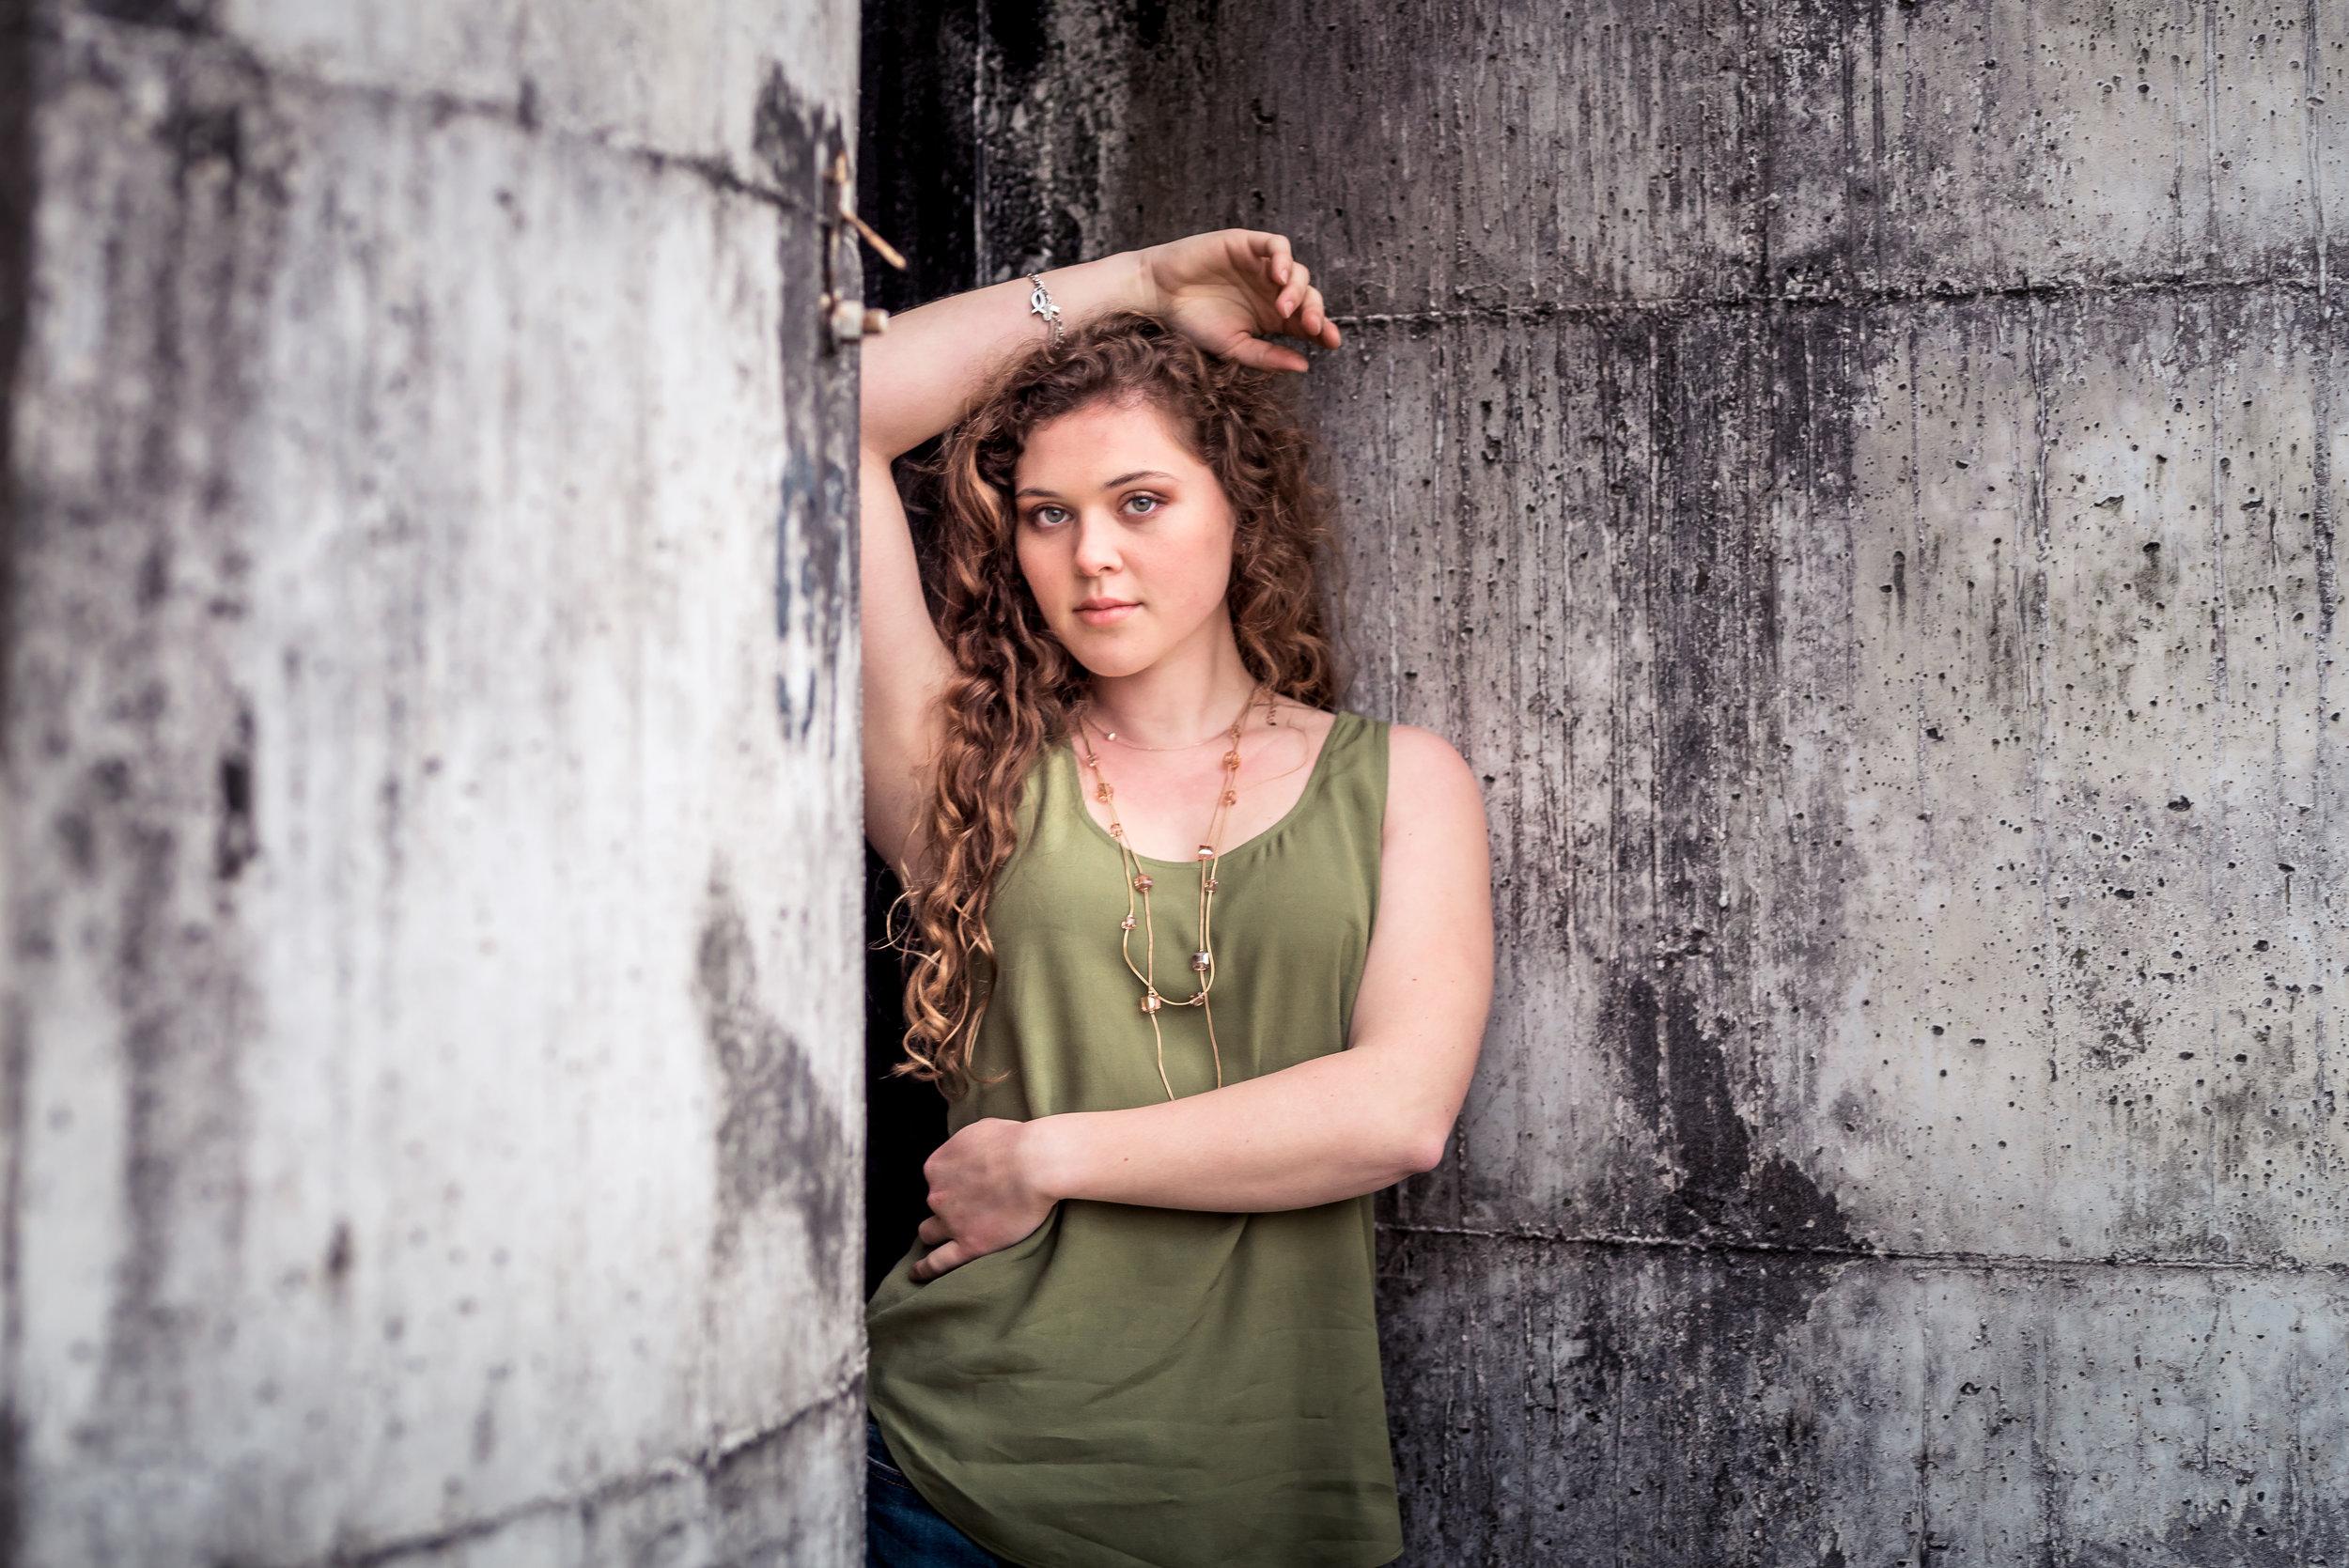 houston-tx-senior-portrait-photographer-Katy-tx-high-school-senior-photographer-sugarland-cypress-fulshear-richmond-senior-photography17.jpg